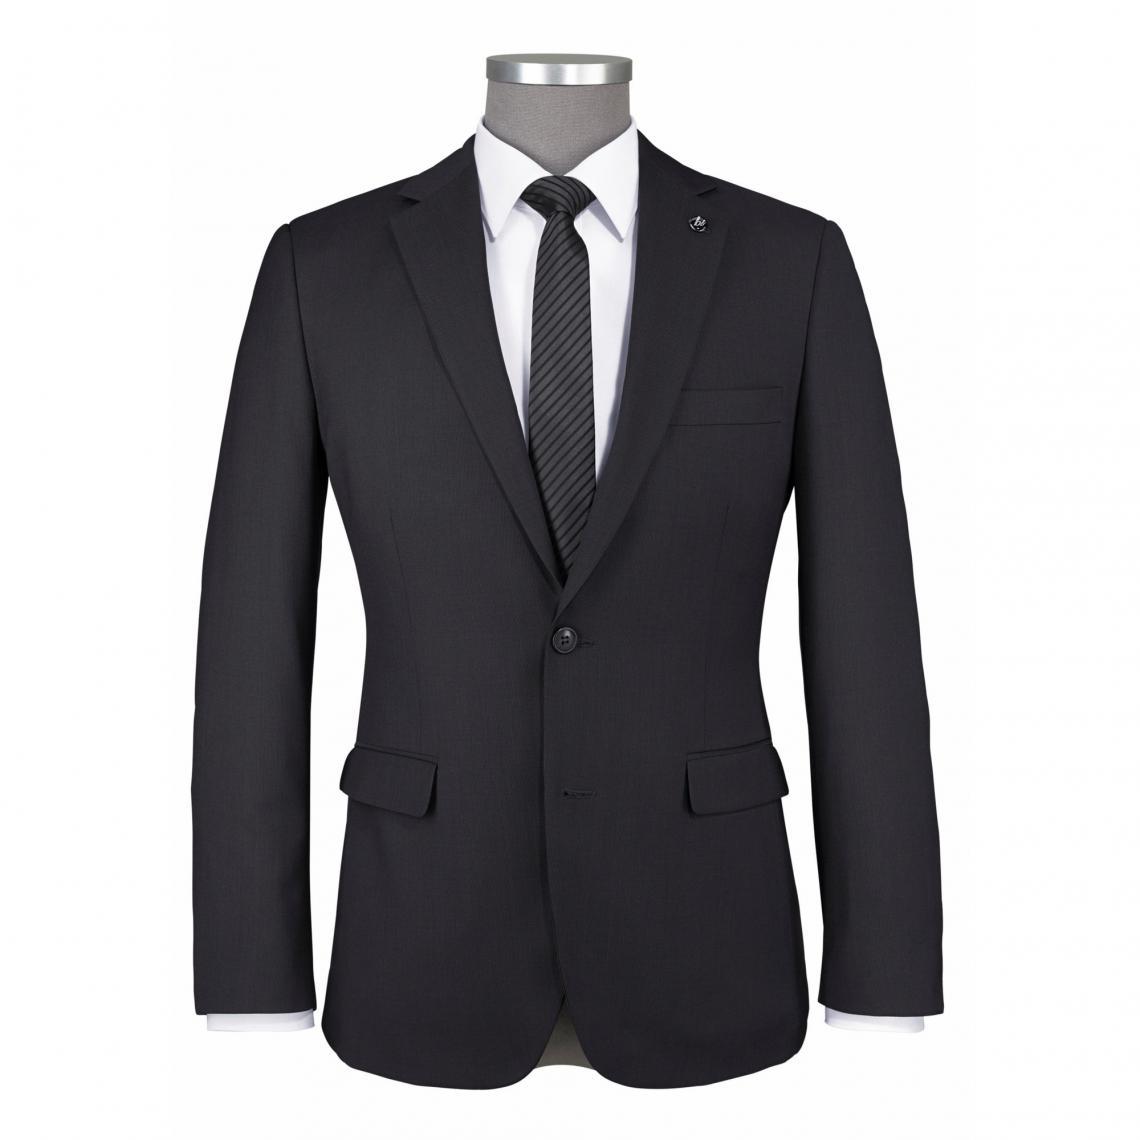 7ed3f68fce0d Veste de costume 2 boutons homme Montana Bruno Banani - Gris Bruno Banani